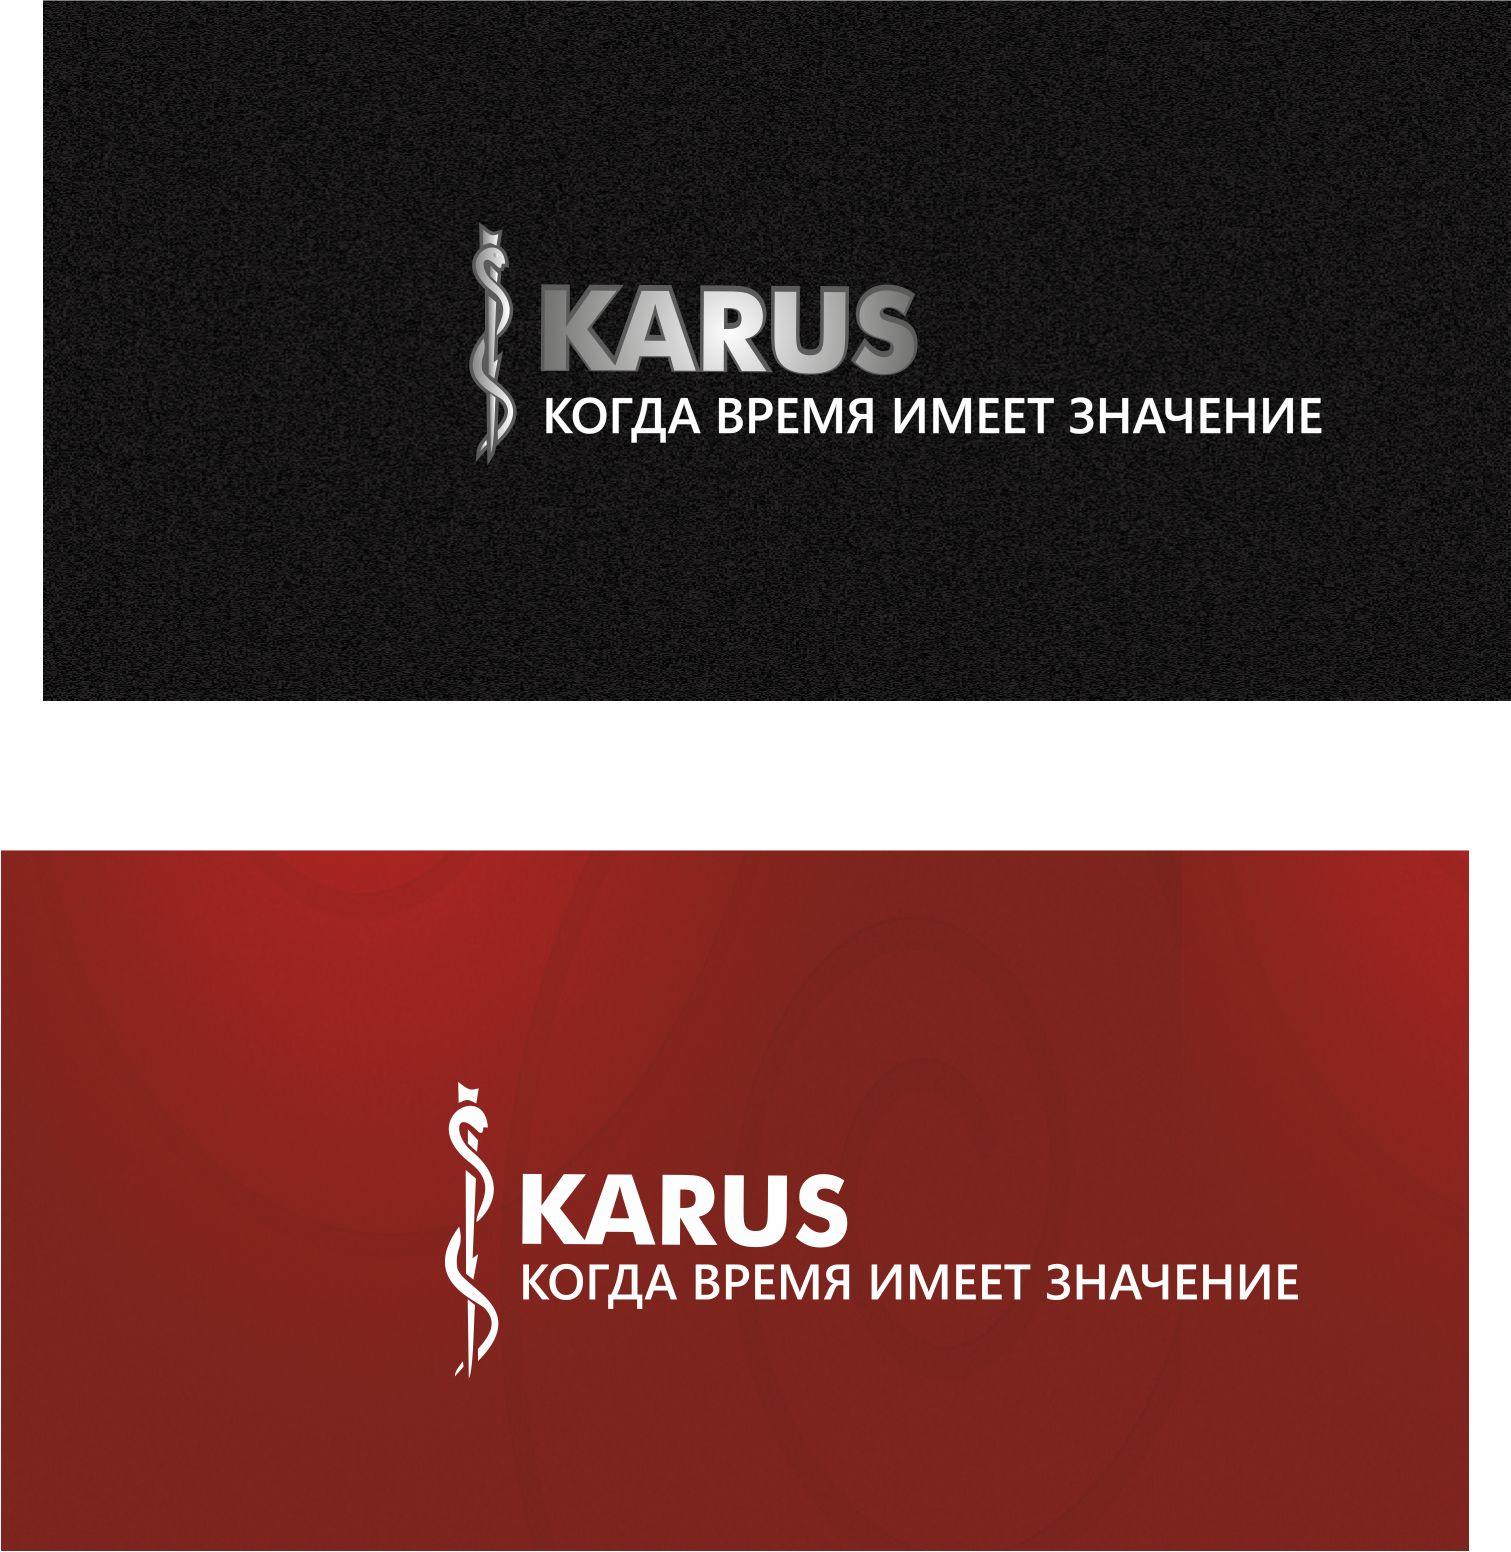 Разработка логотипа, фирменных цветов и фирменного знака фото f_226535402bfbaef3.jpg